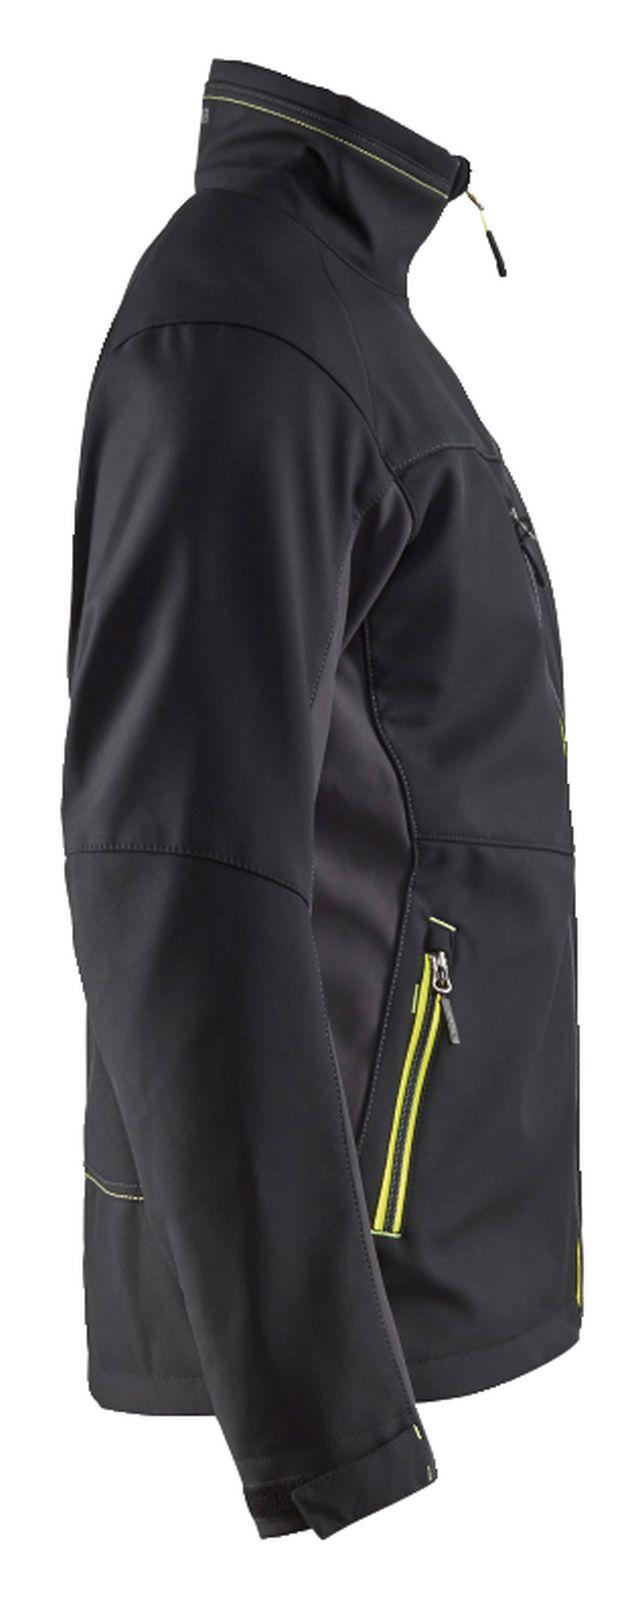 Blaklader Softshell jacks 49502516 zwart-geel(9933)